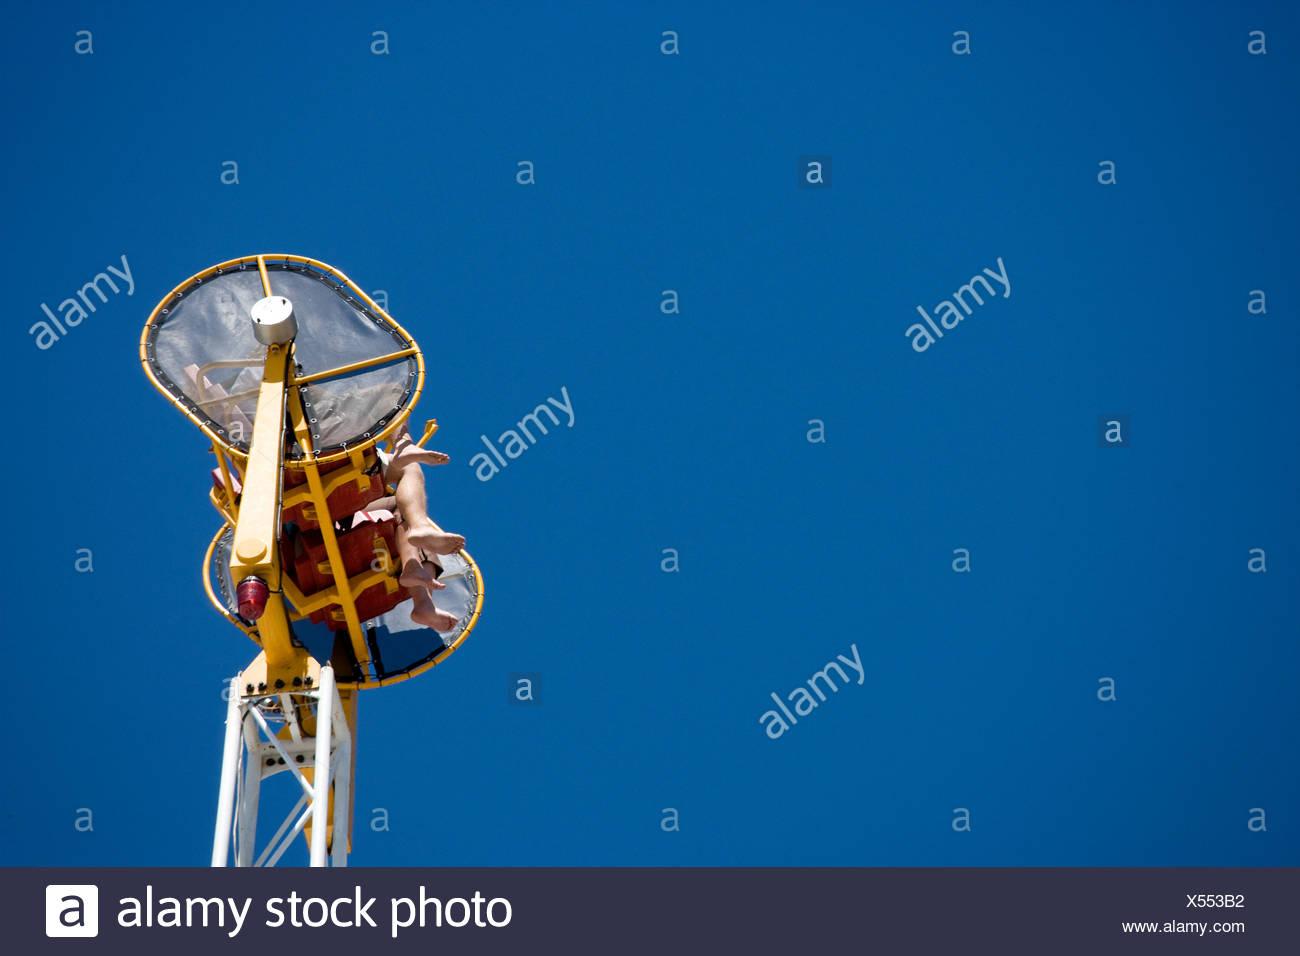 Feet dangle from an amusement park ride. - Stock Image